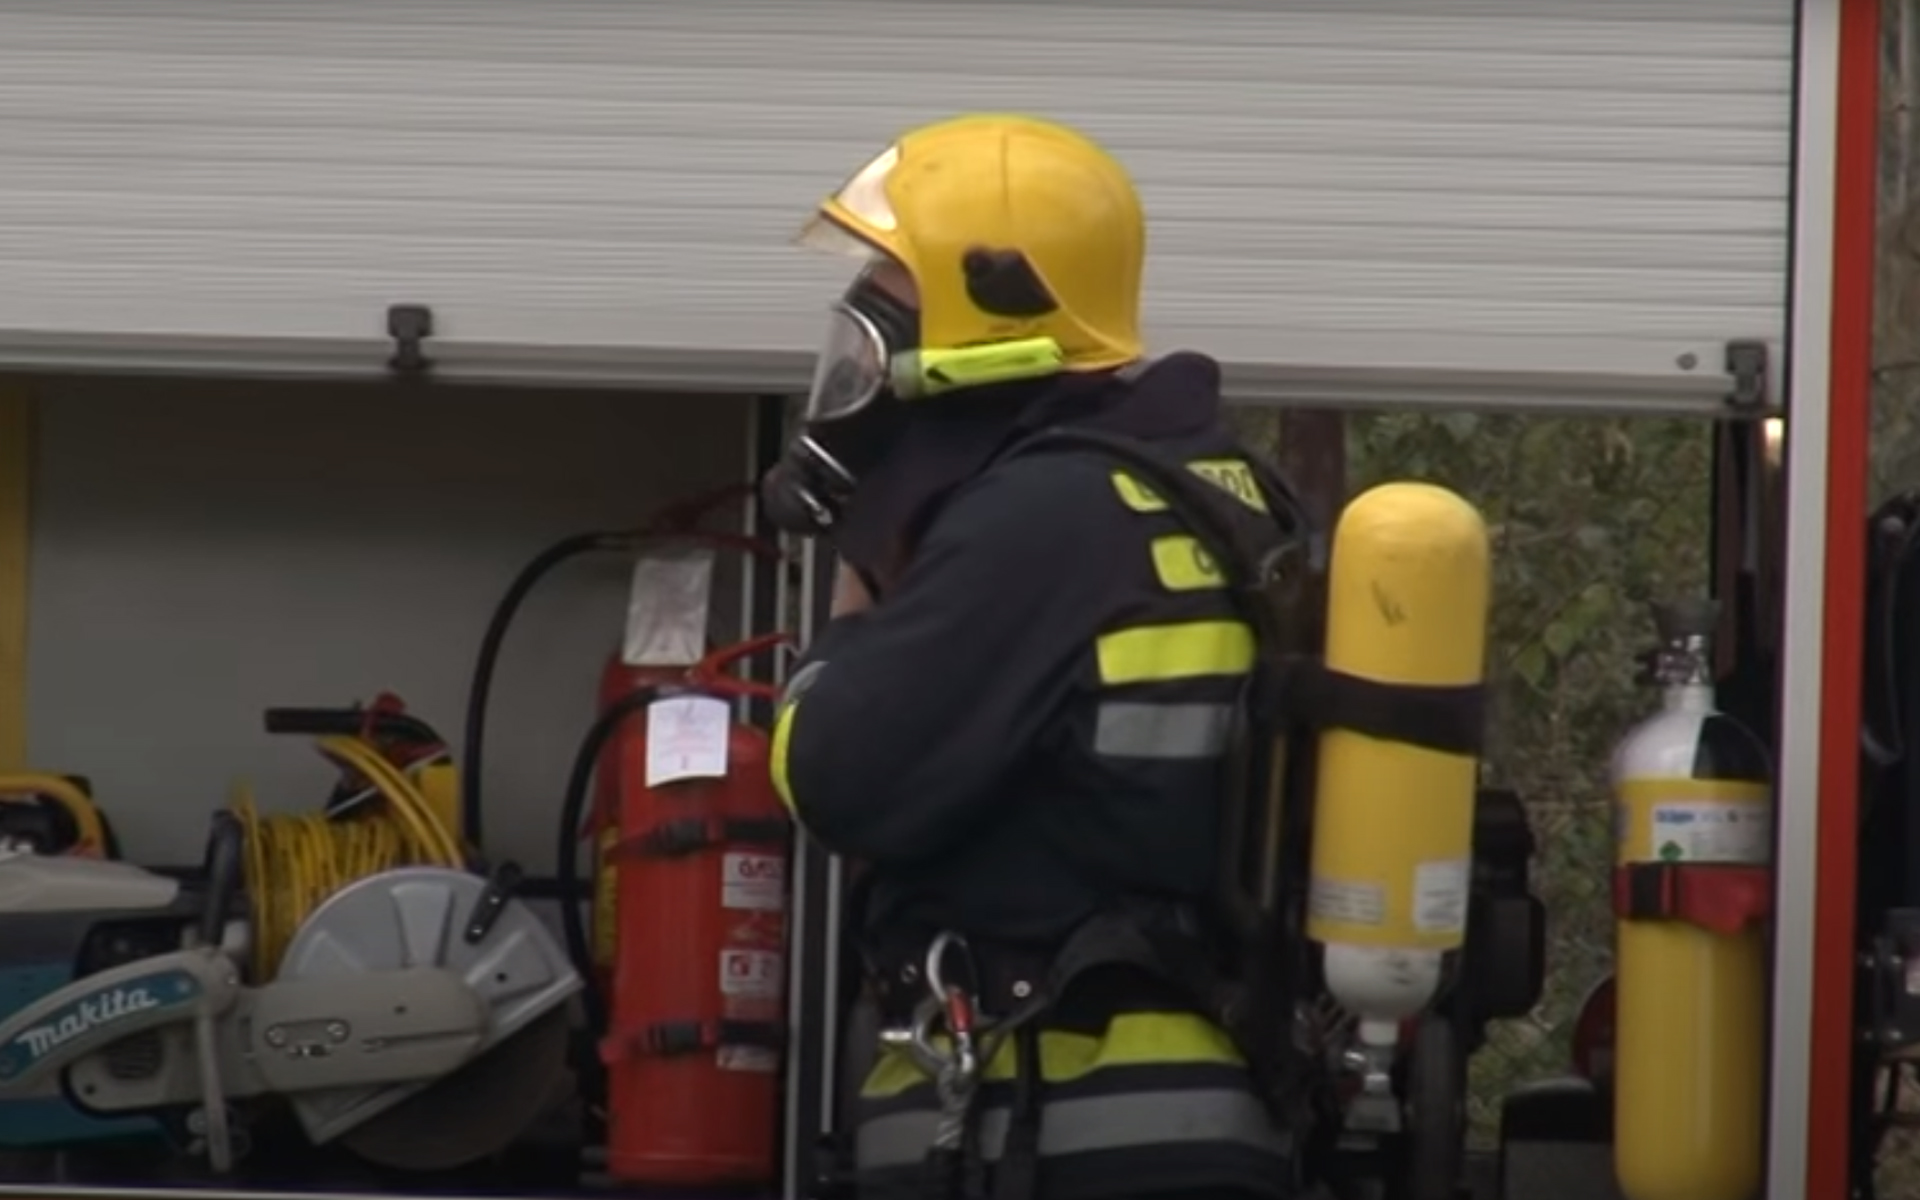 Konkurs za upis 300 polaznika na osnovnu obuku pripadnika vatrogasno-spasilačkih jedinica